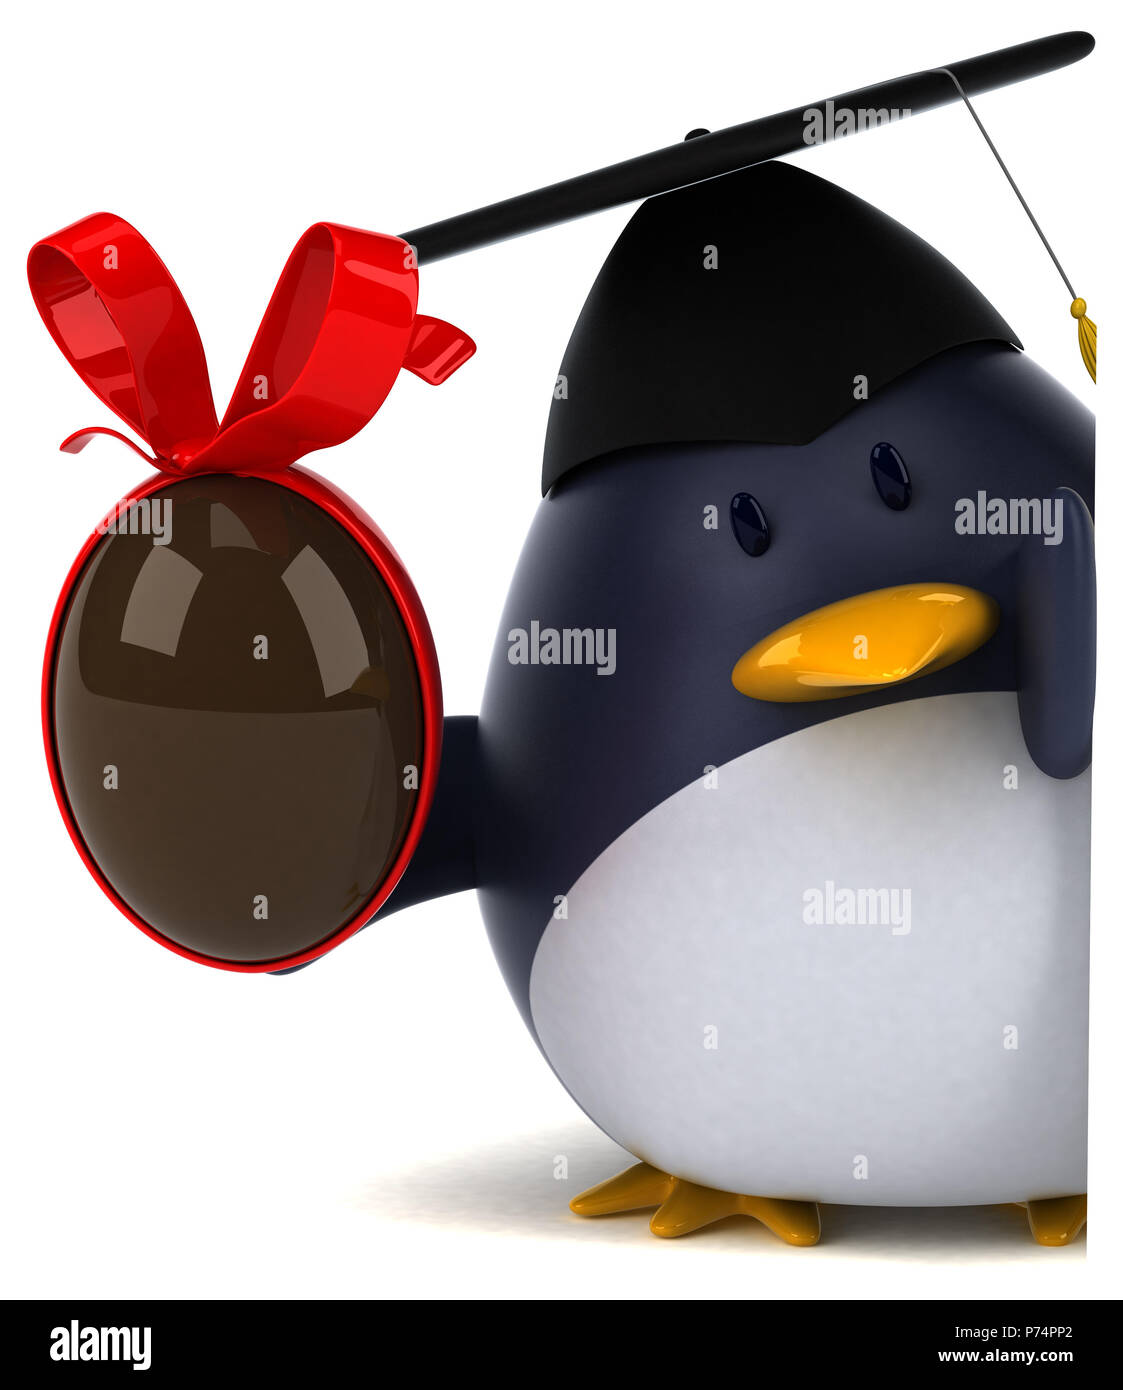 Fun penguin - 3D Illustration - Stock Image